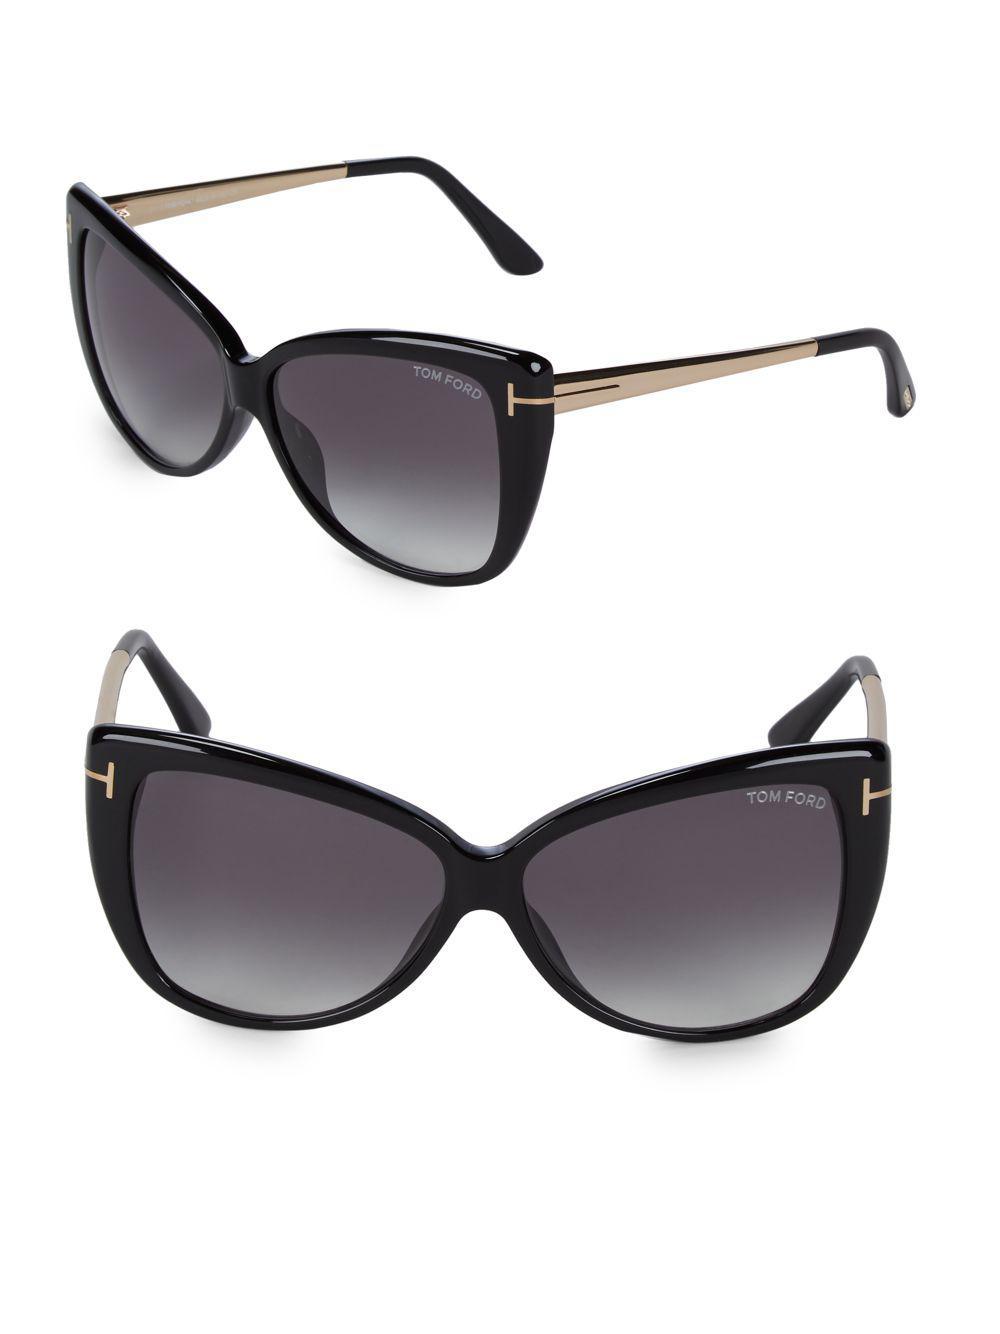 dd8eae5e6ac Tom Ford - Black 57mm Butterfly Sunglasses - Lyst. View fullscreen